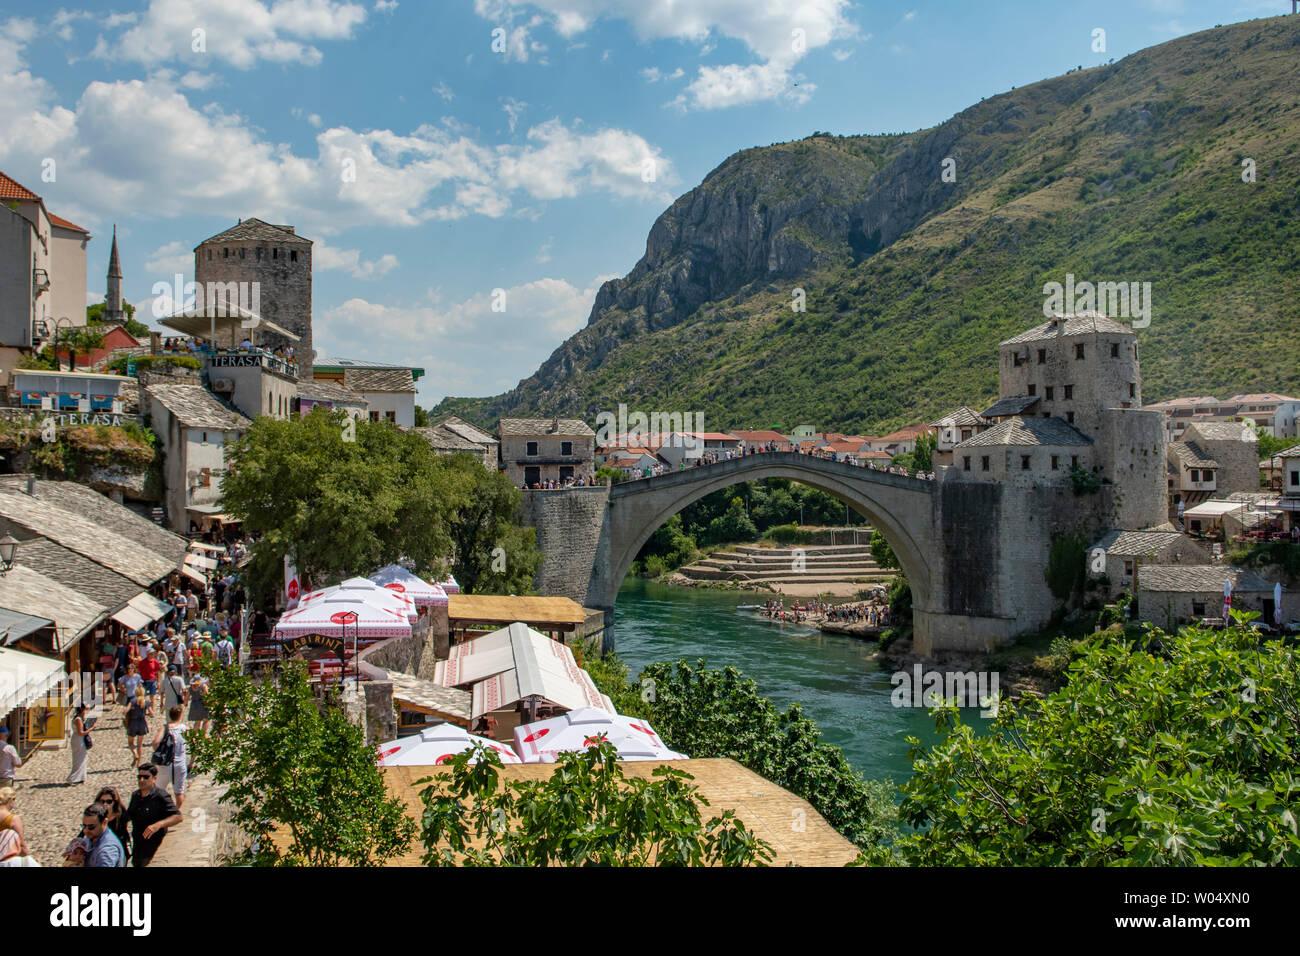 Stari Most, Old Bridge, Mostar, Bosnia-Herzegovina - Stock Image